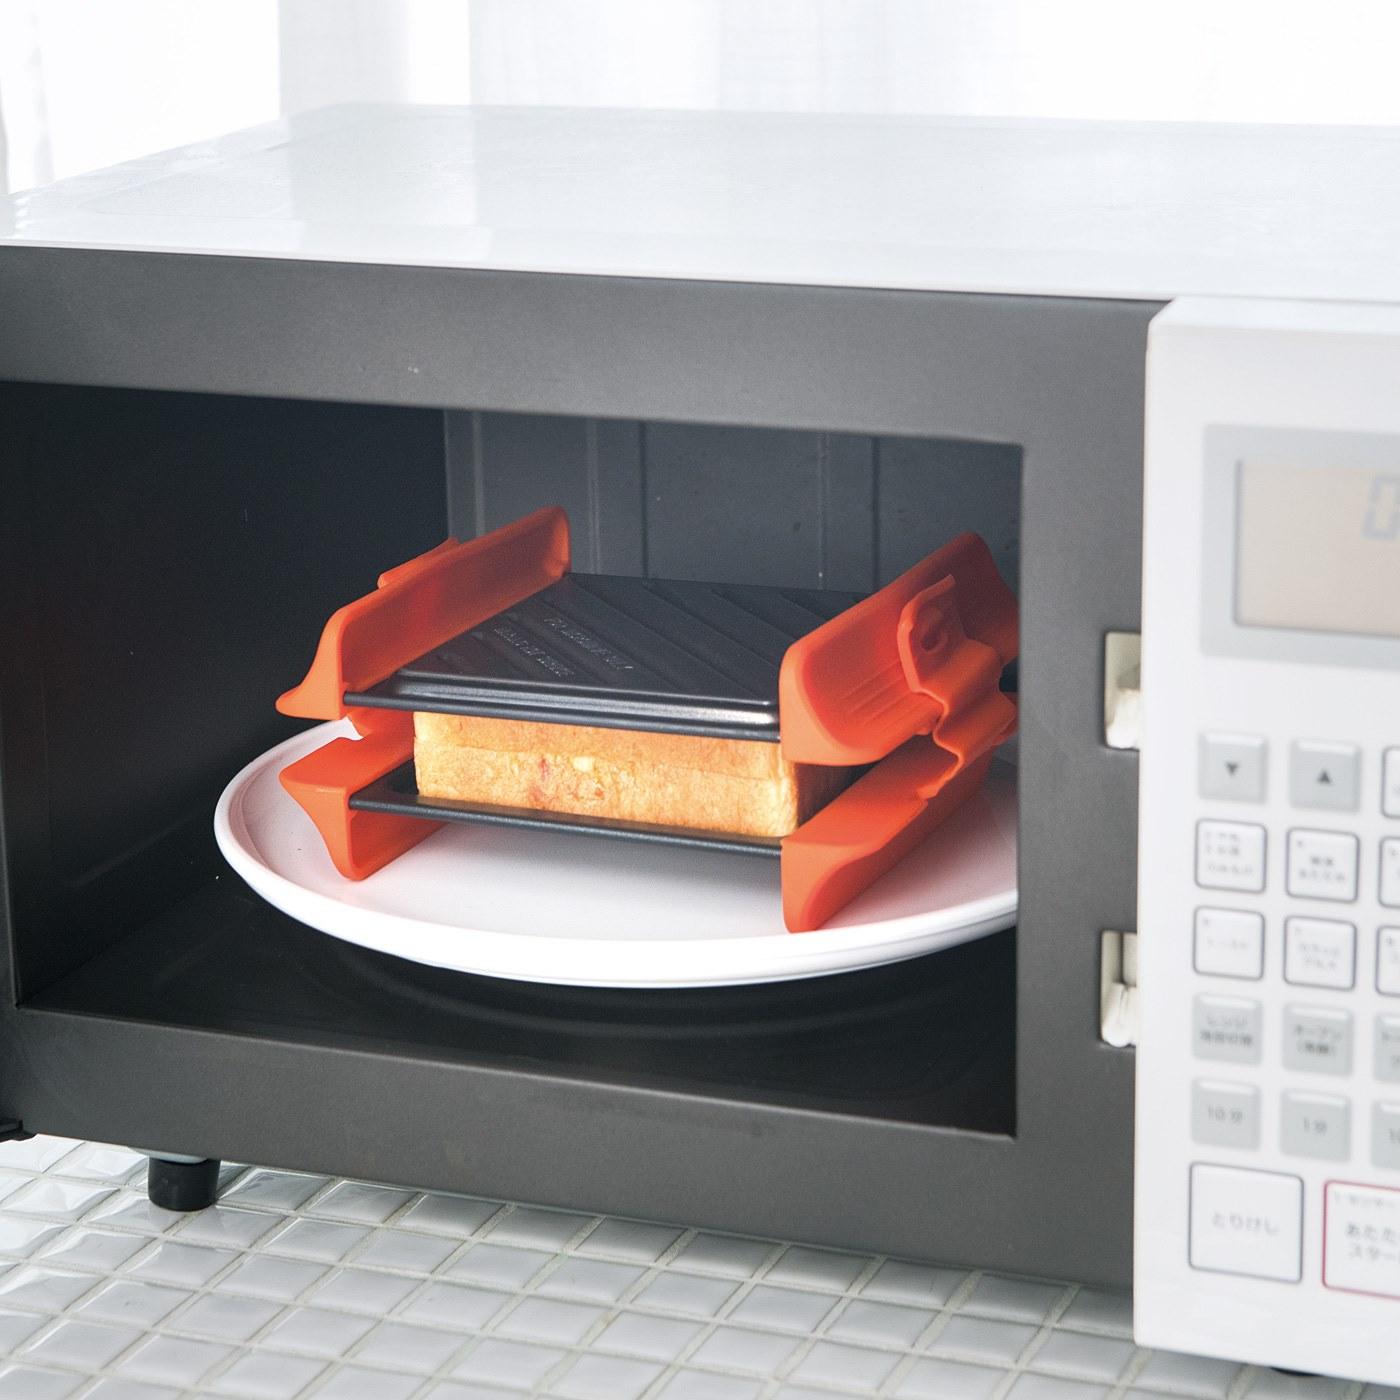 How to use : 2.電子レンジ(600W)で片面約3分ずつ、両面を加熱します。